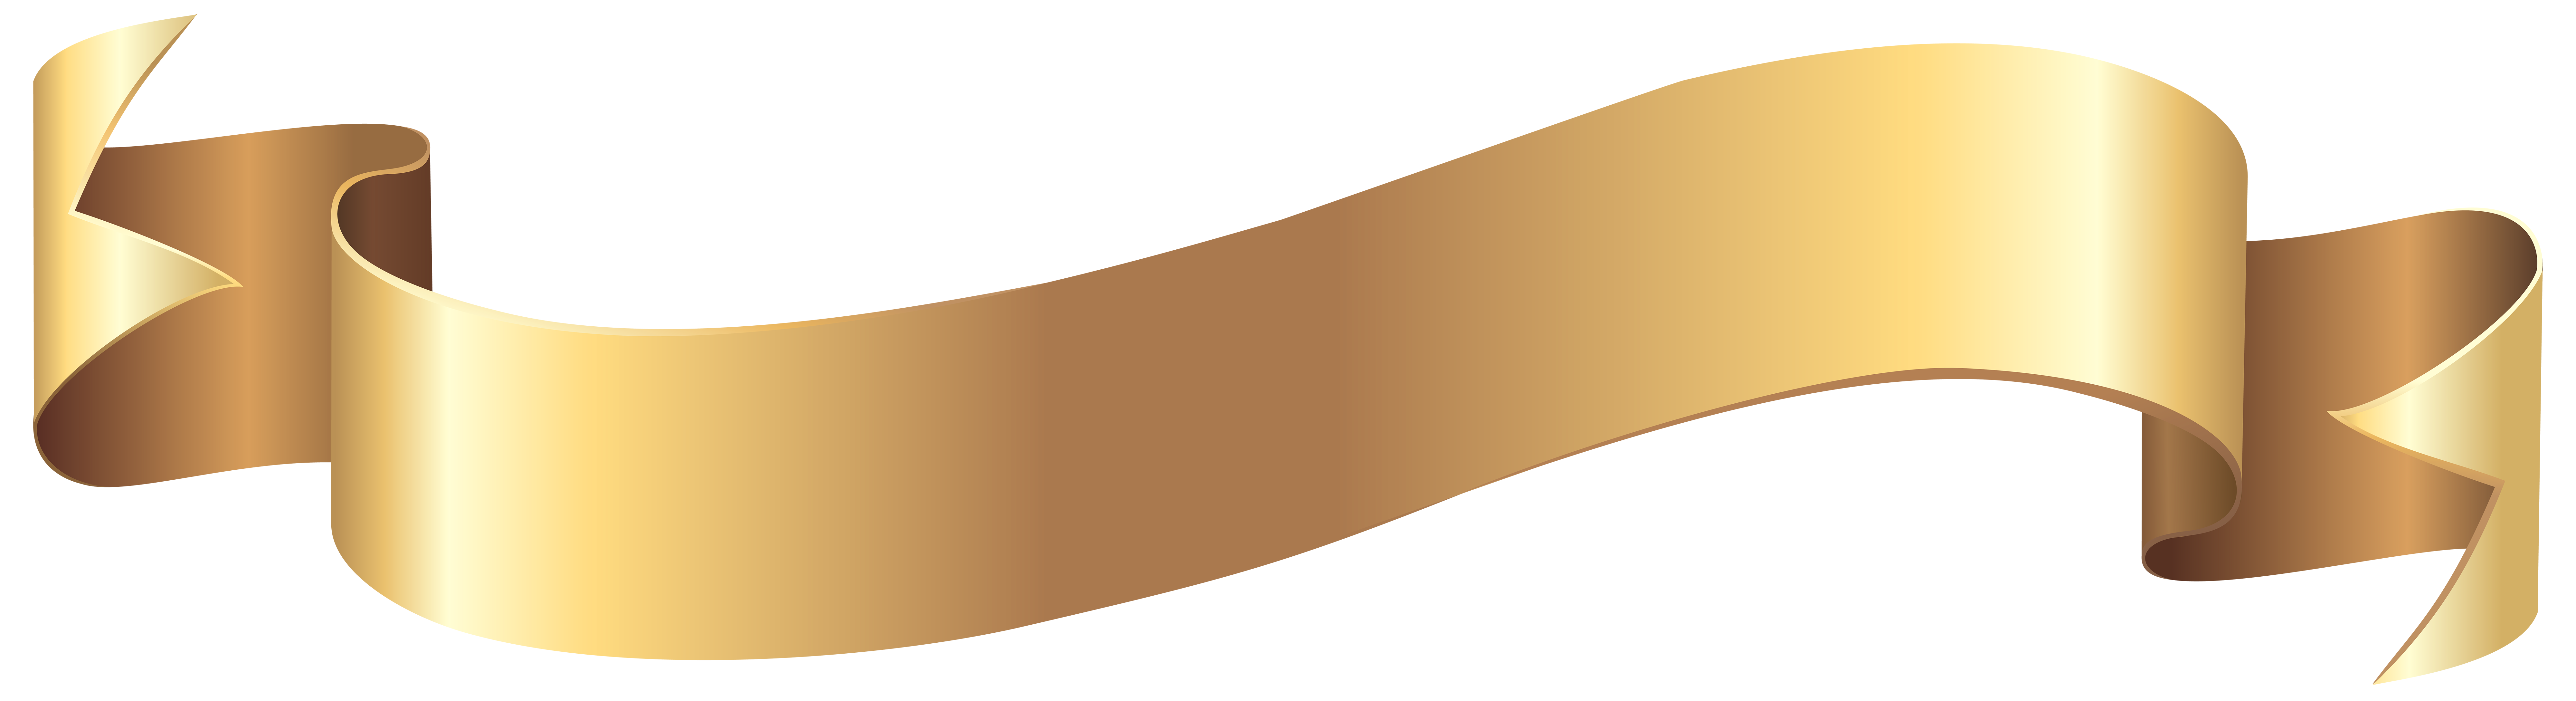 Clipart banner yellow ribbon. Gold png clip art